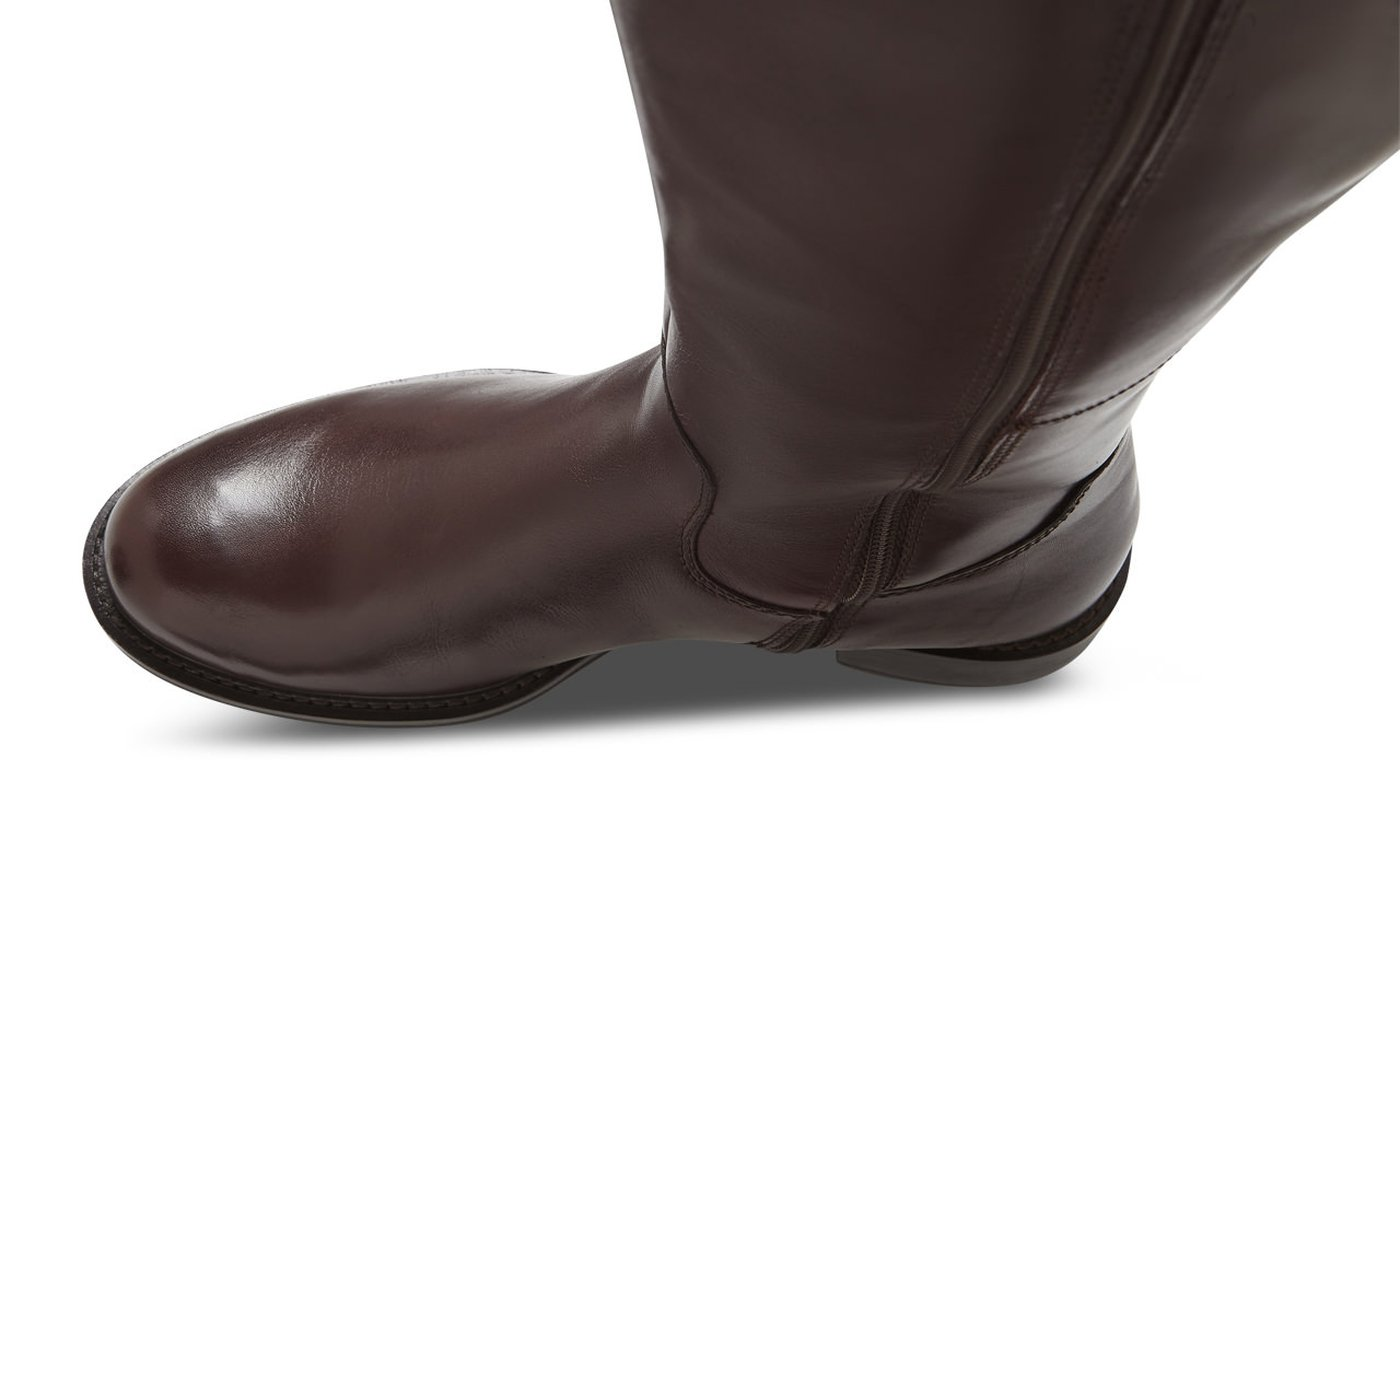 ECCO SHAPE Riding Boot 25mm